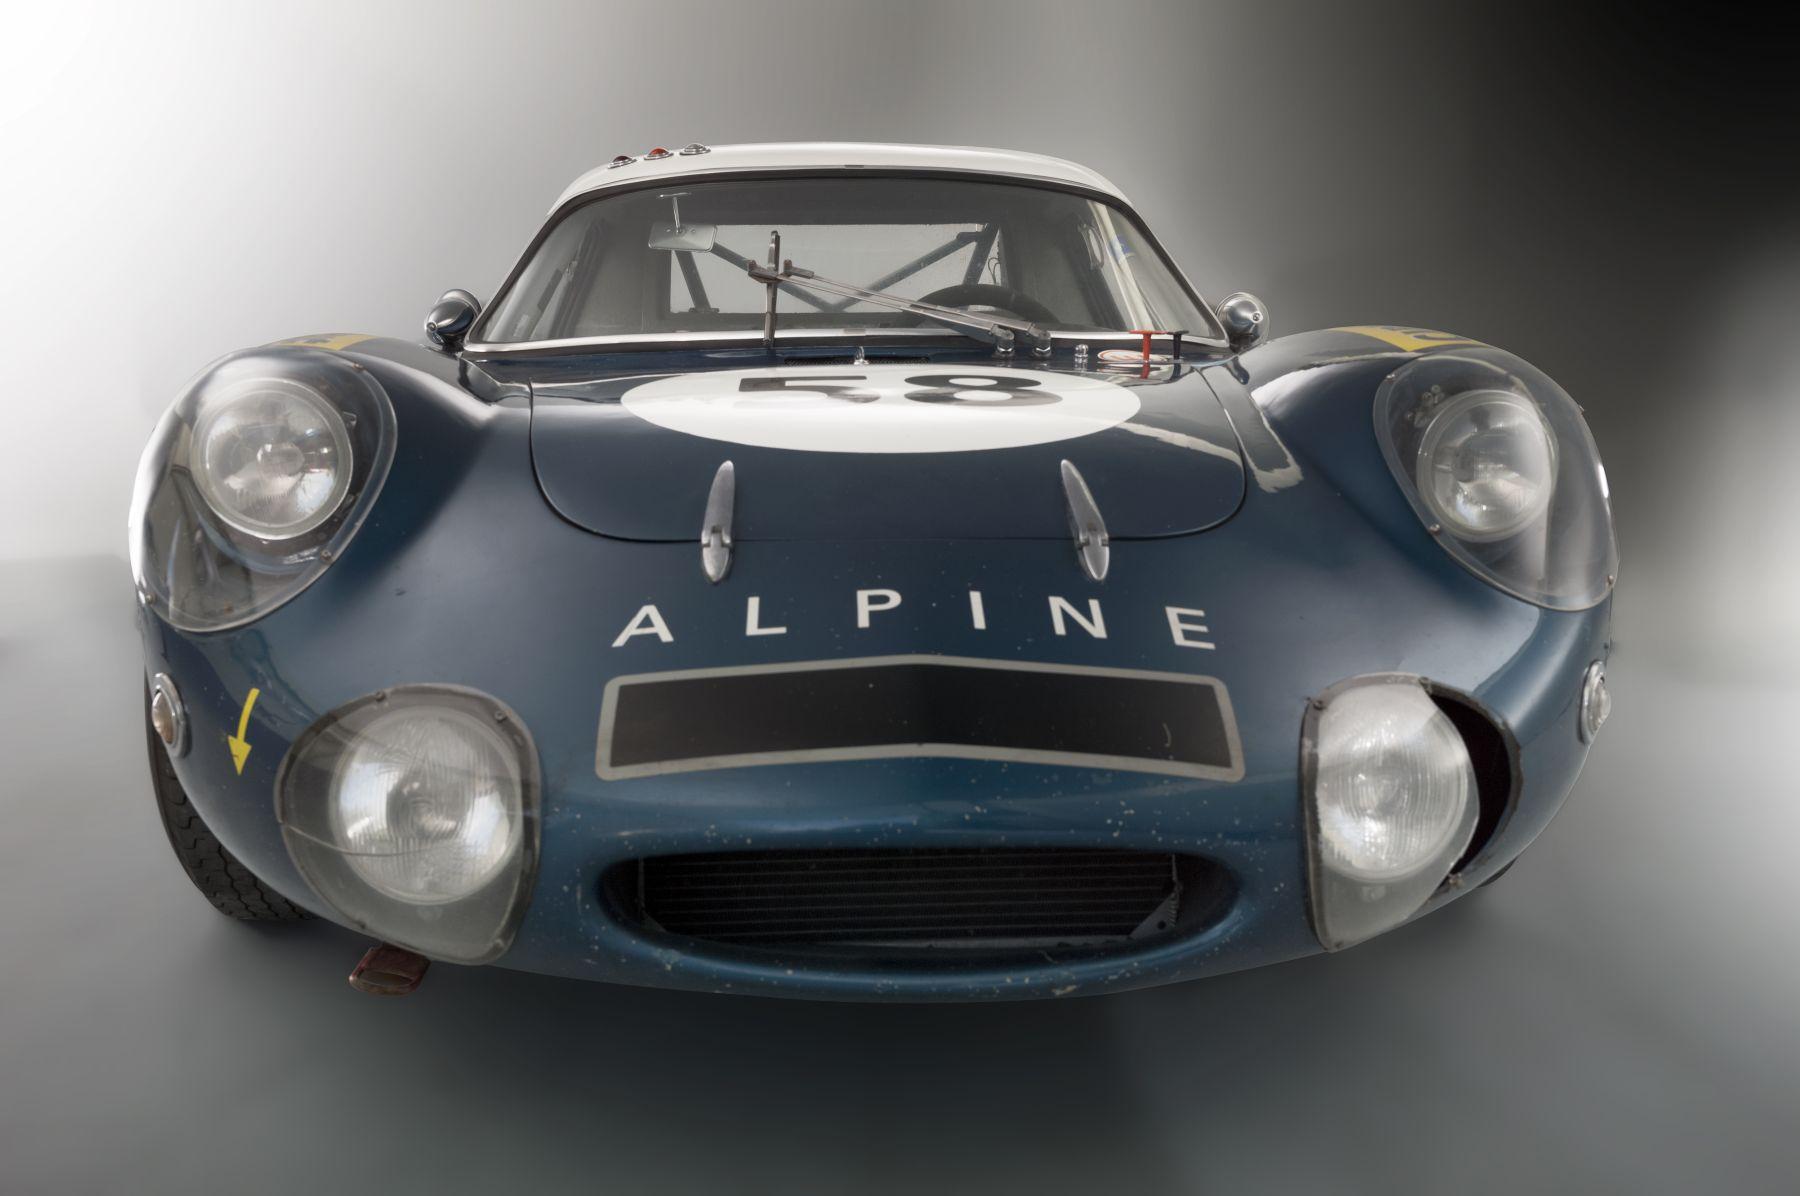 Alpine A210 Le Mans 1966 classicdriver com 20_12